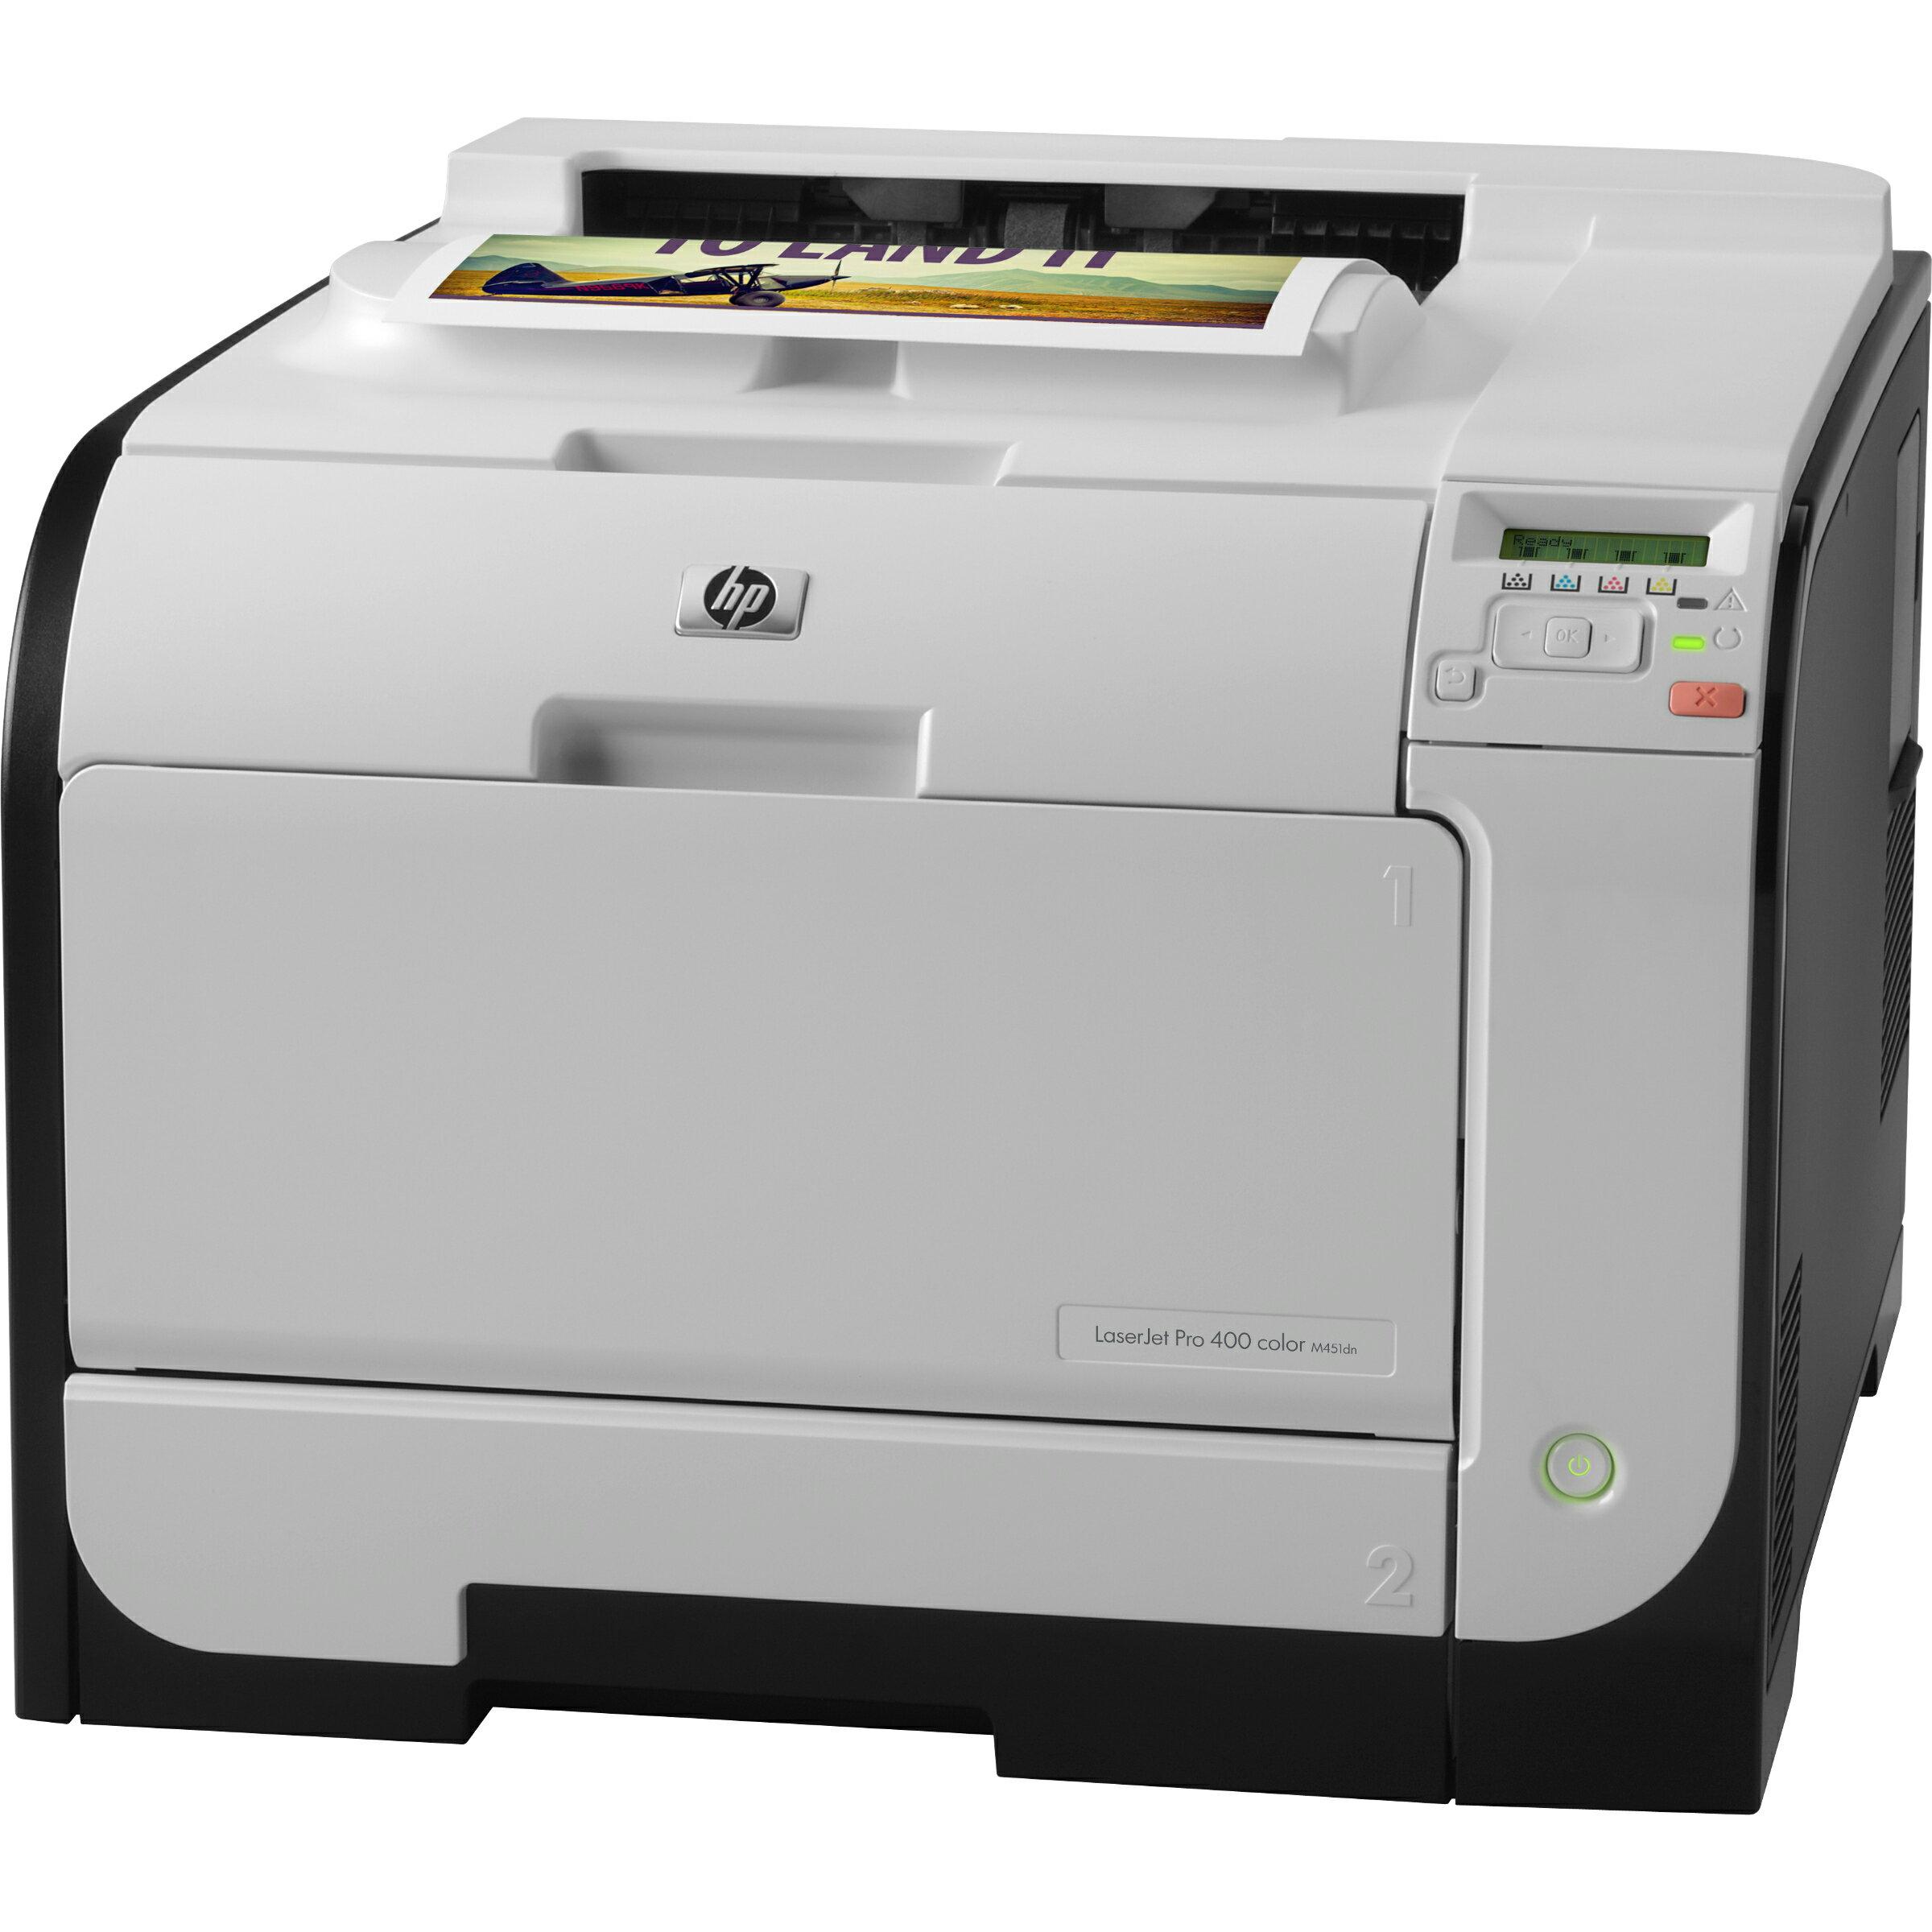 HP LaserJet Pro 400 M451DN Laser Printer - Refurbished - Color - 600 x 600 dpi Print - Plain Paper Print - Desktop - 21 ppm Mono / 21 ppm Color Print - 300 sheets Standard Input Capacity - 40000 pages per month - Automatic Duplex Print - LCD - Ethernet - 2